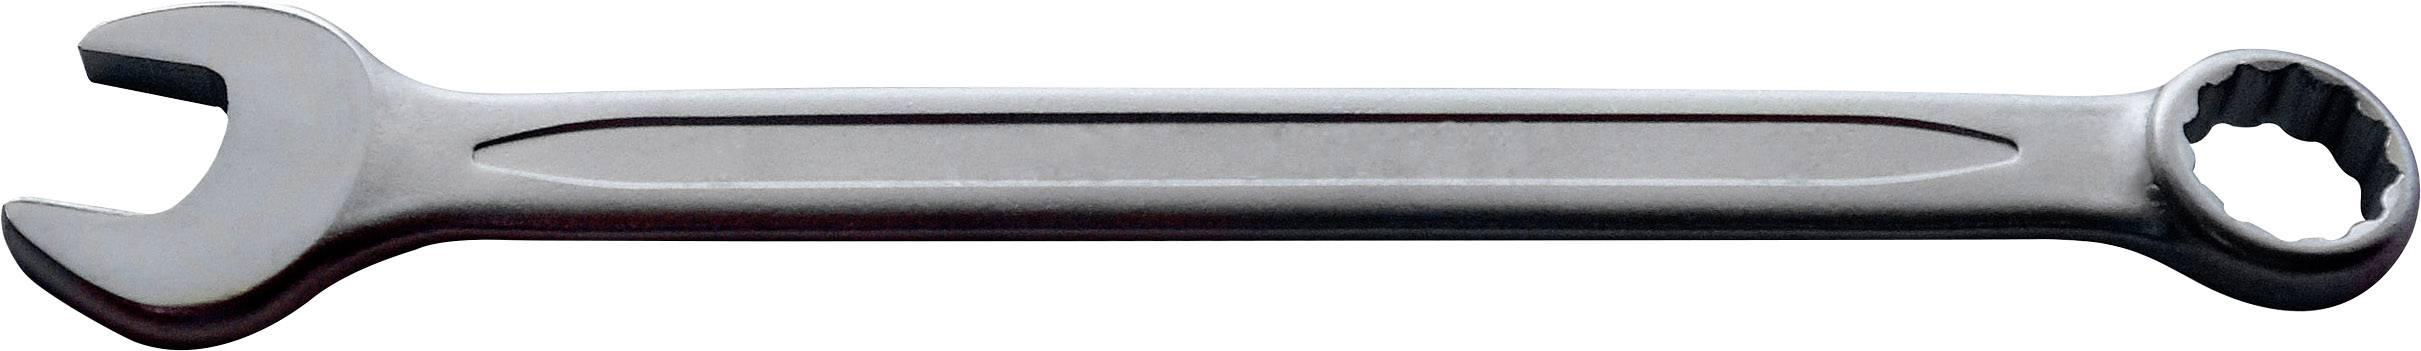 Očkoplochý kľúč TOOLCRAFT 820832, DIN 3113 Form A, 8 mm